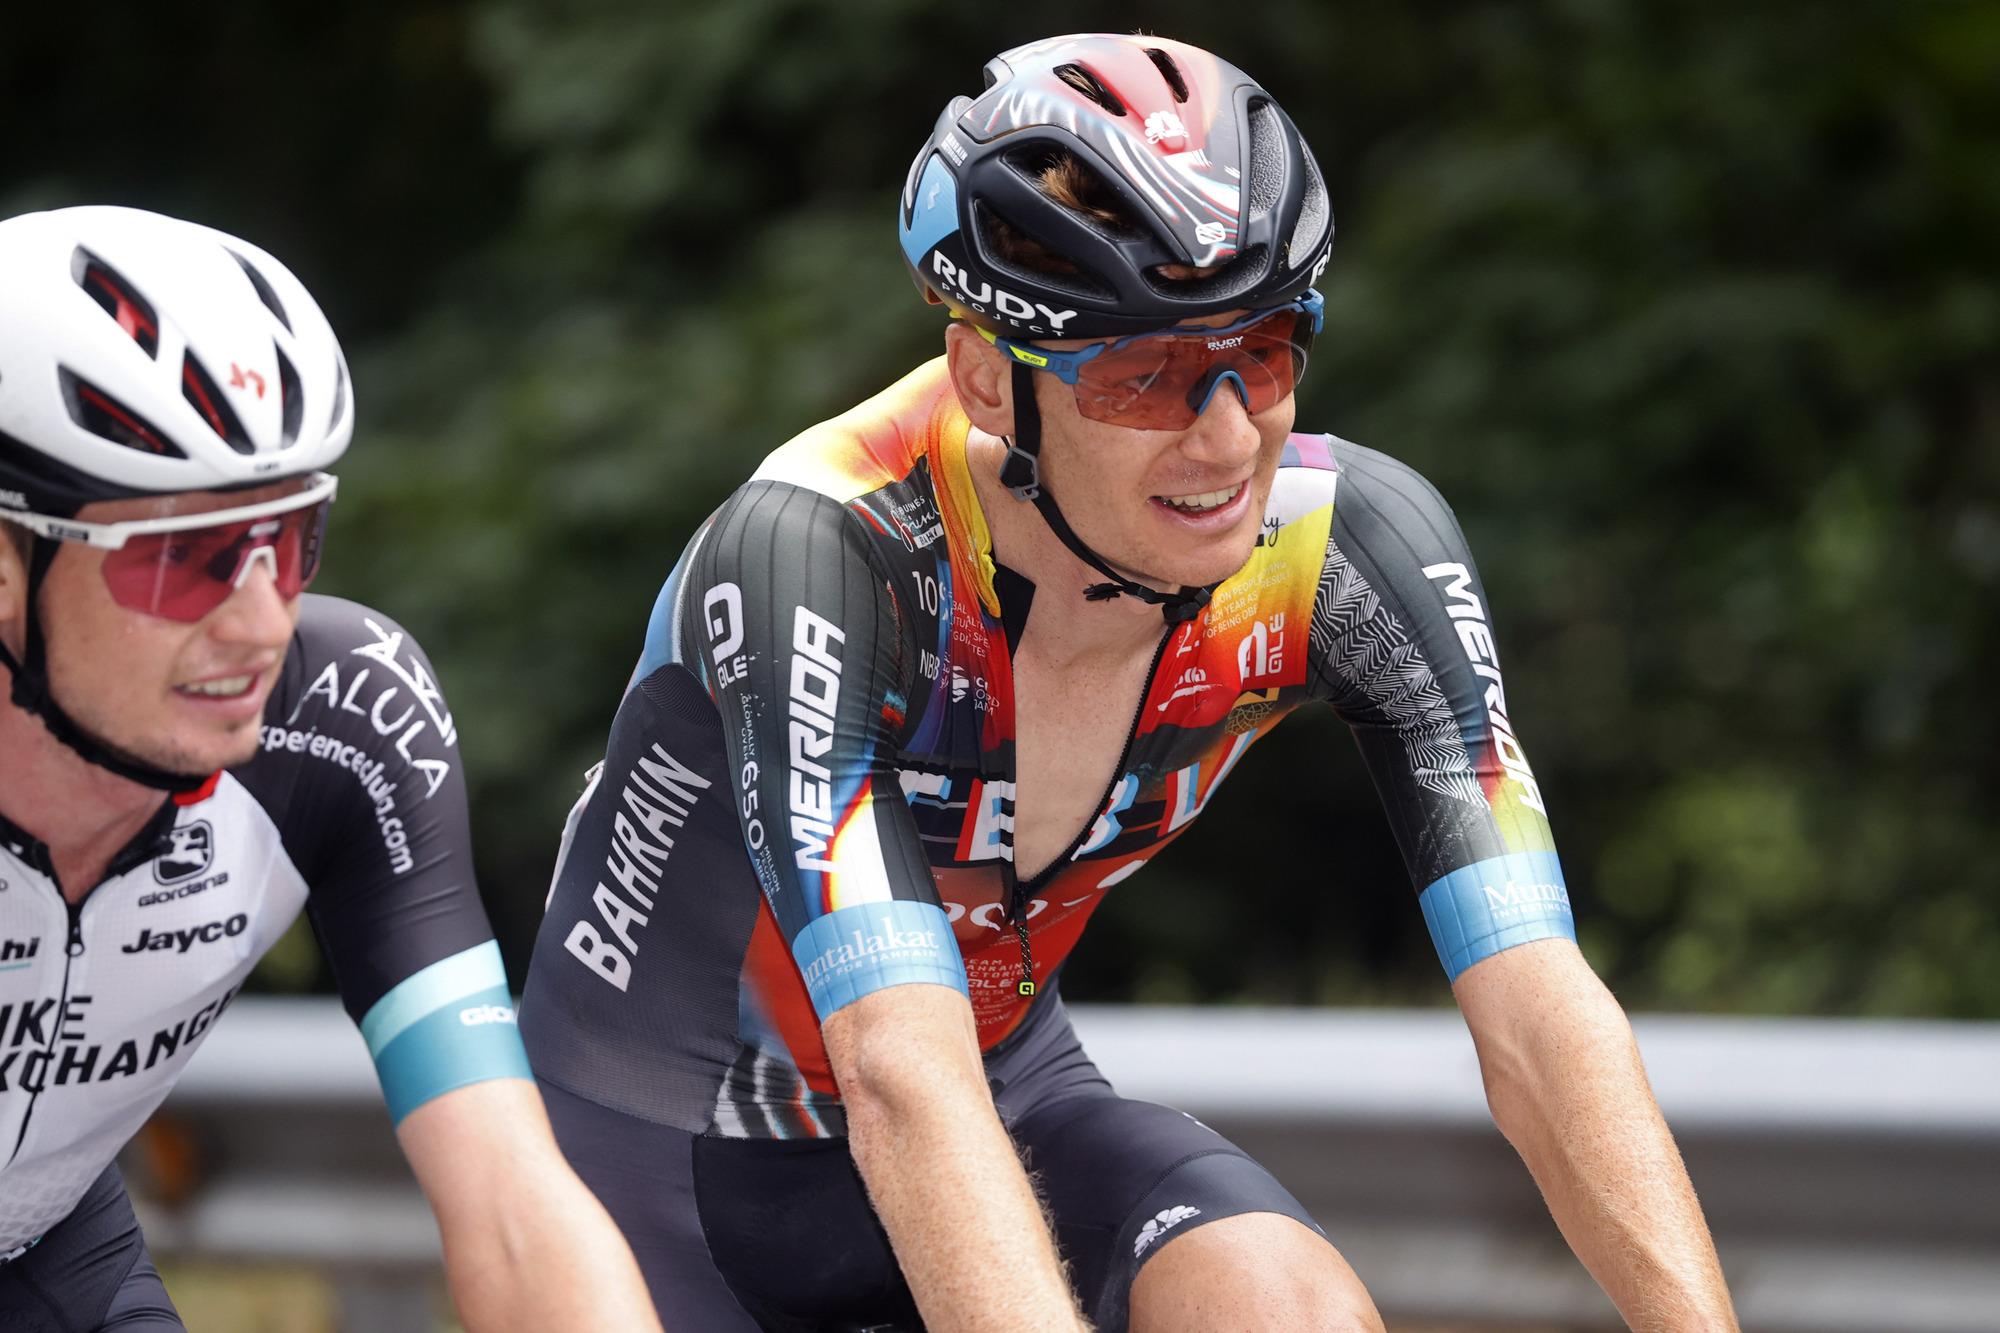 Vuelta Espana 2021 - 76th Edition - 18th stage Salas - Altu d'El Gamoniteiru 162,6 km - 02/09/2021 - Jack Haig (AUS - Bahrain Victorious) - photo Luis Angel Gomez/BettiniPhoto©2021